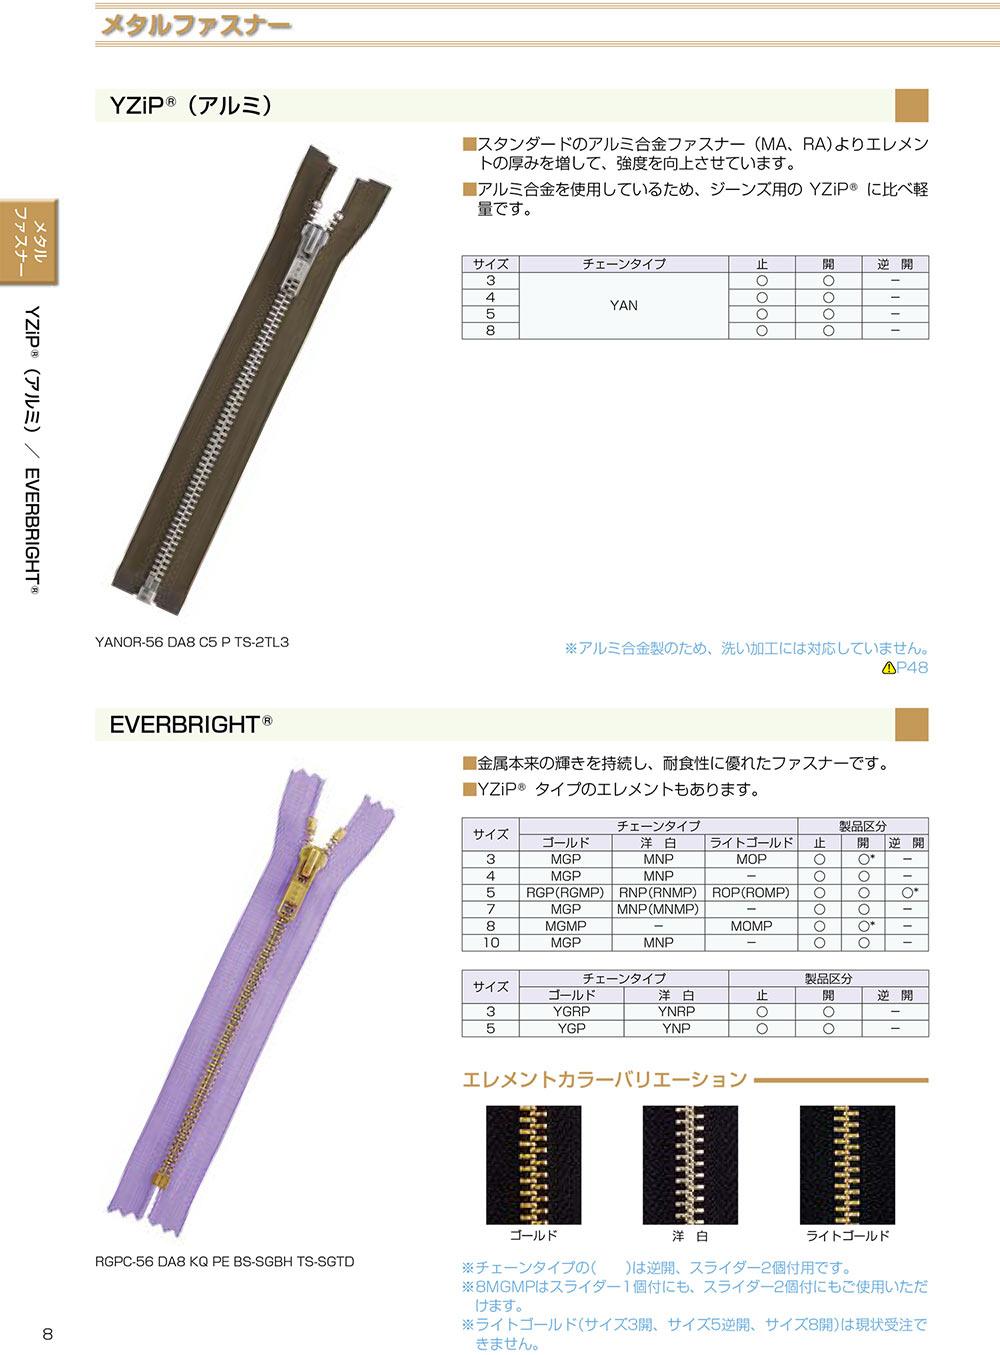 3YANC YKK YZIPワイジップ(アルミ)3サイズ クローズ[ファスナー] YKK/オークラ商事 - ApparelX アパレル資材卸通販